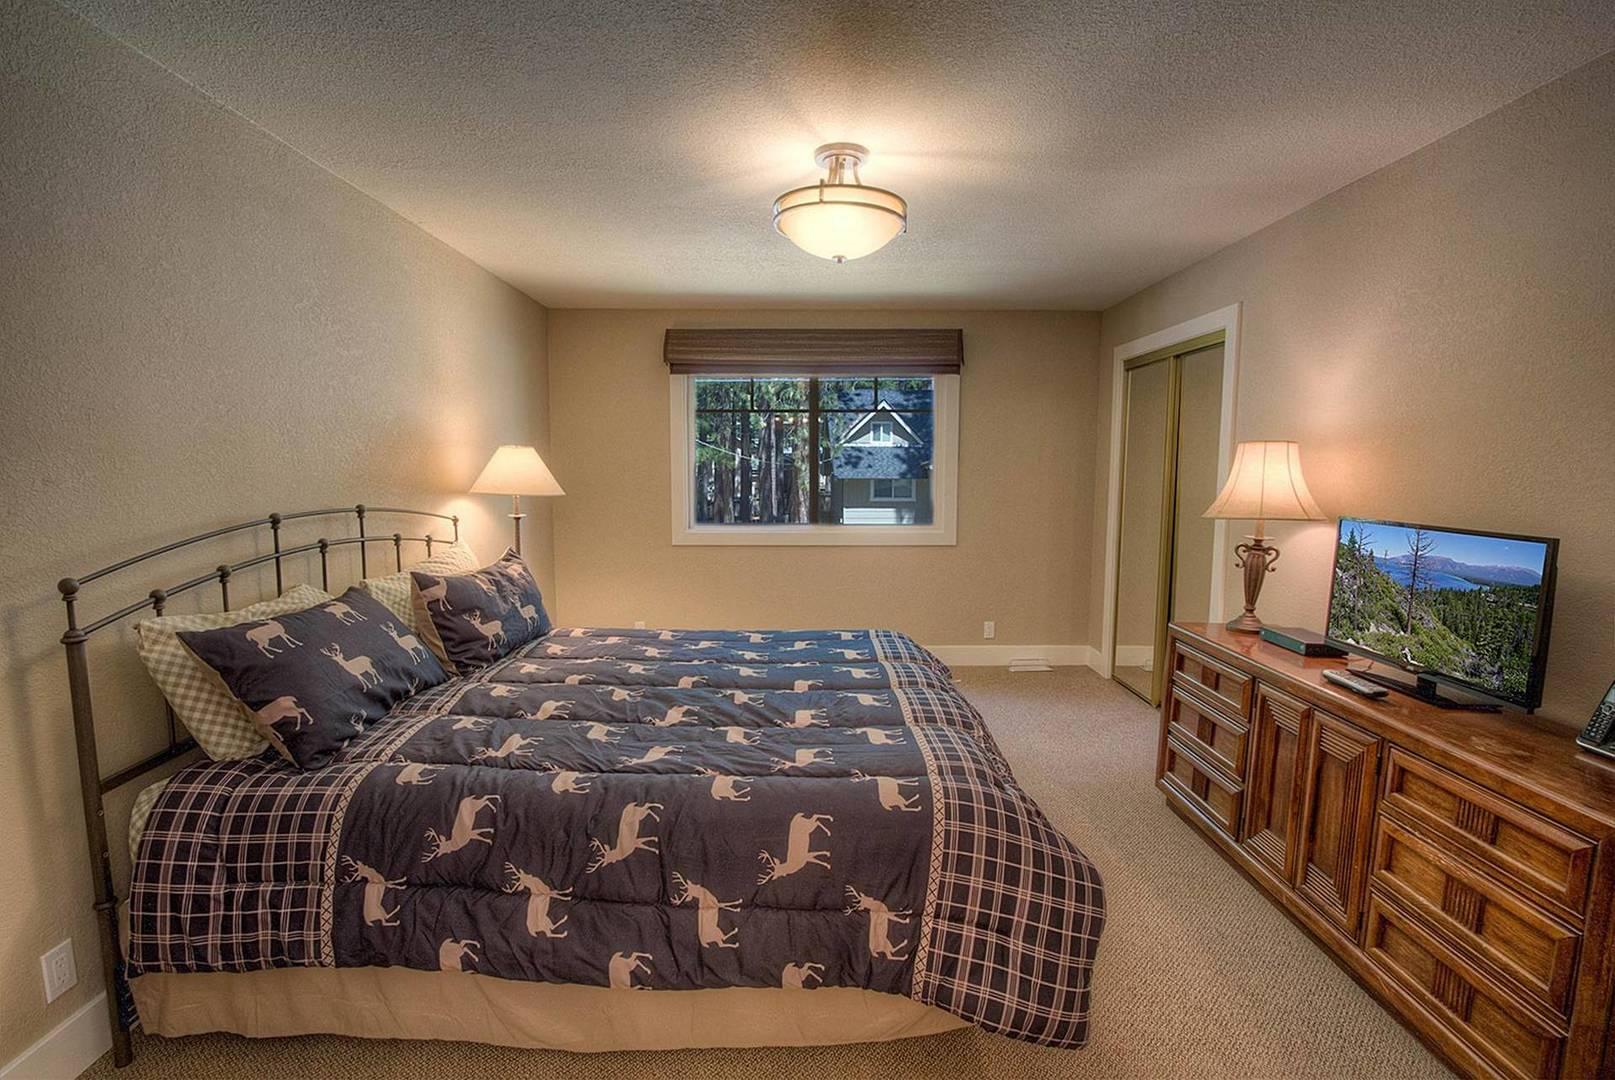 hch0682 bedroom